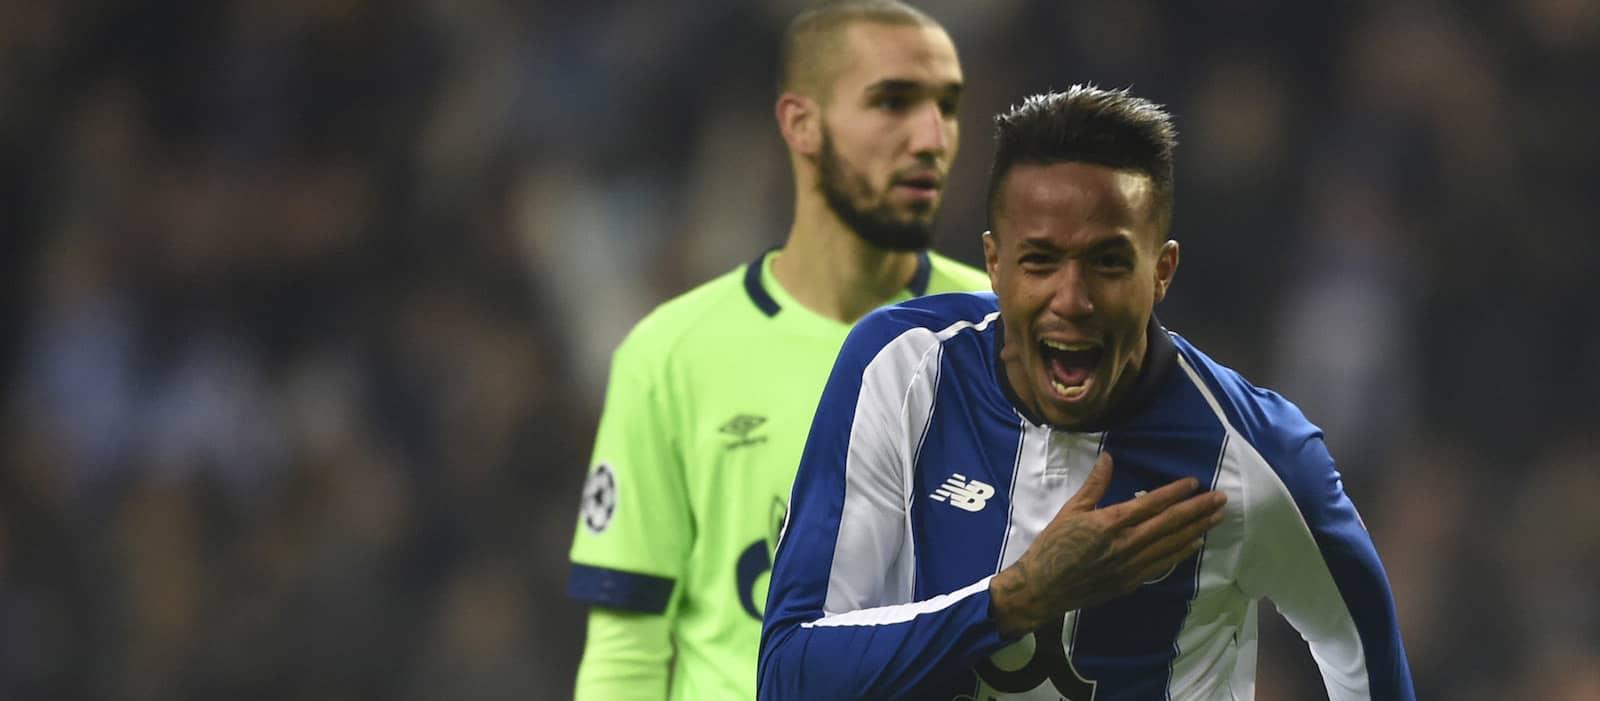 Manchester United target Porto's Eder Militao for January transfer: report